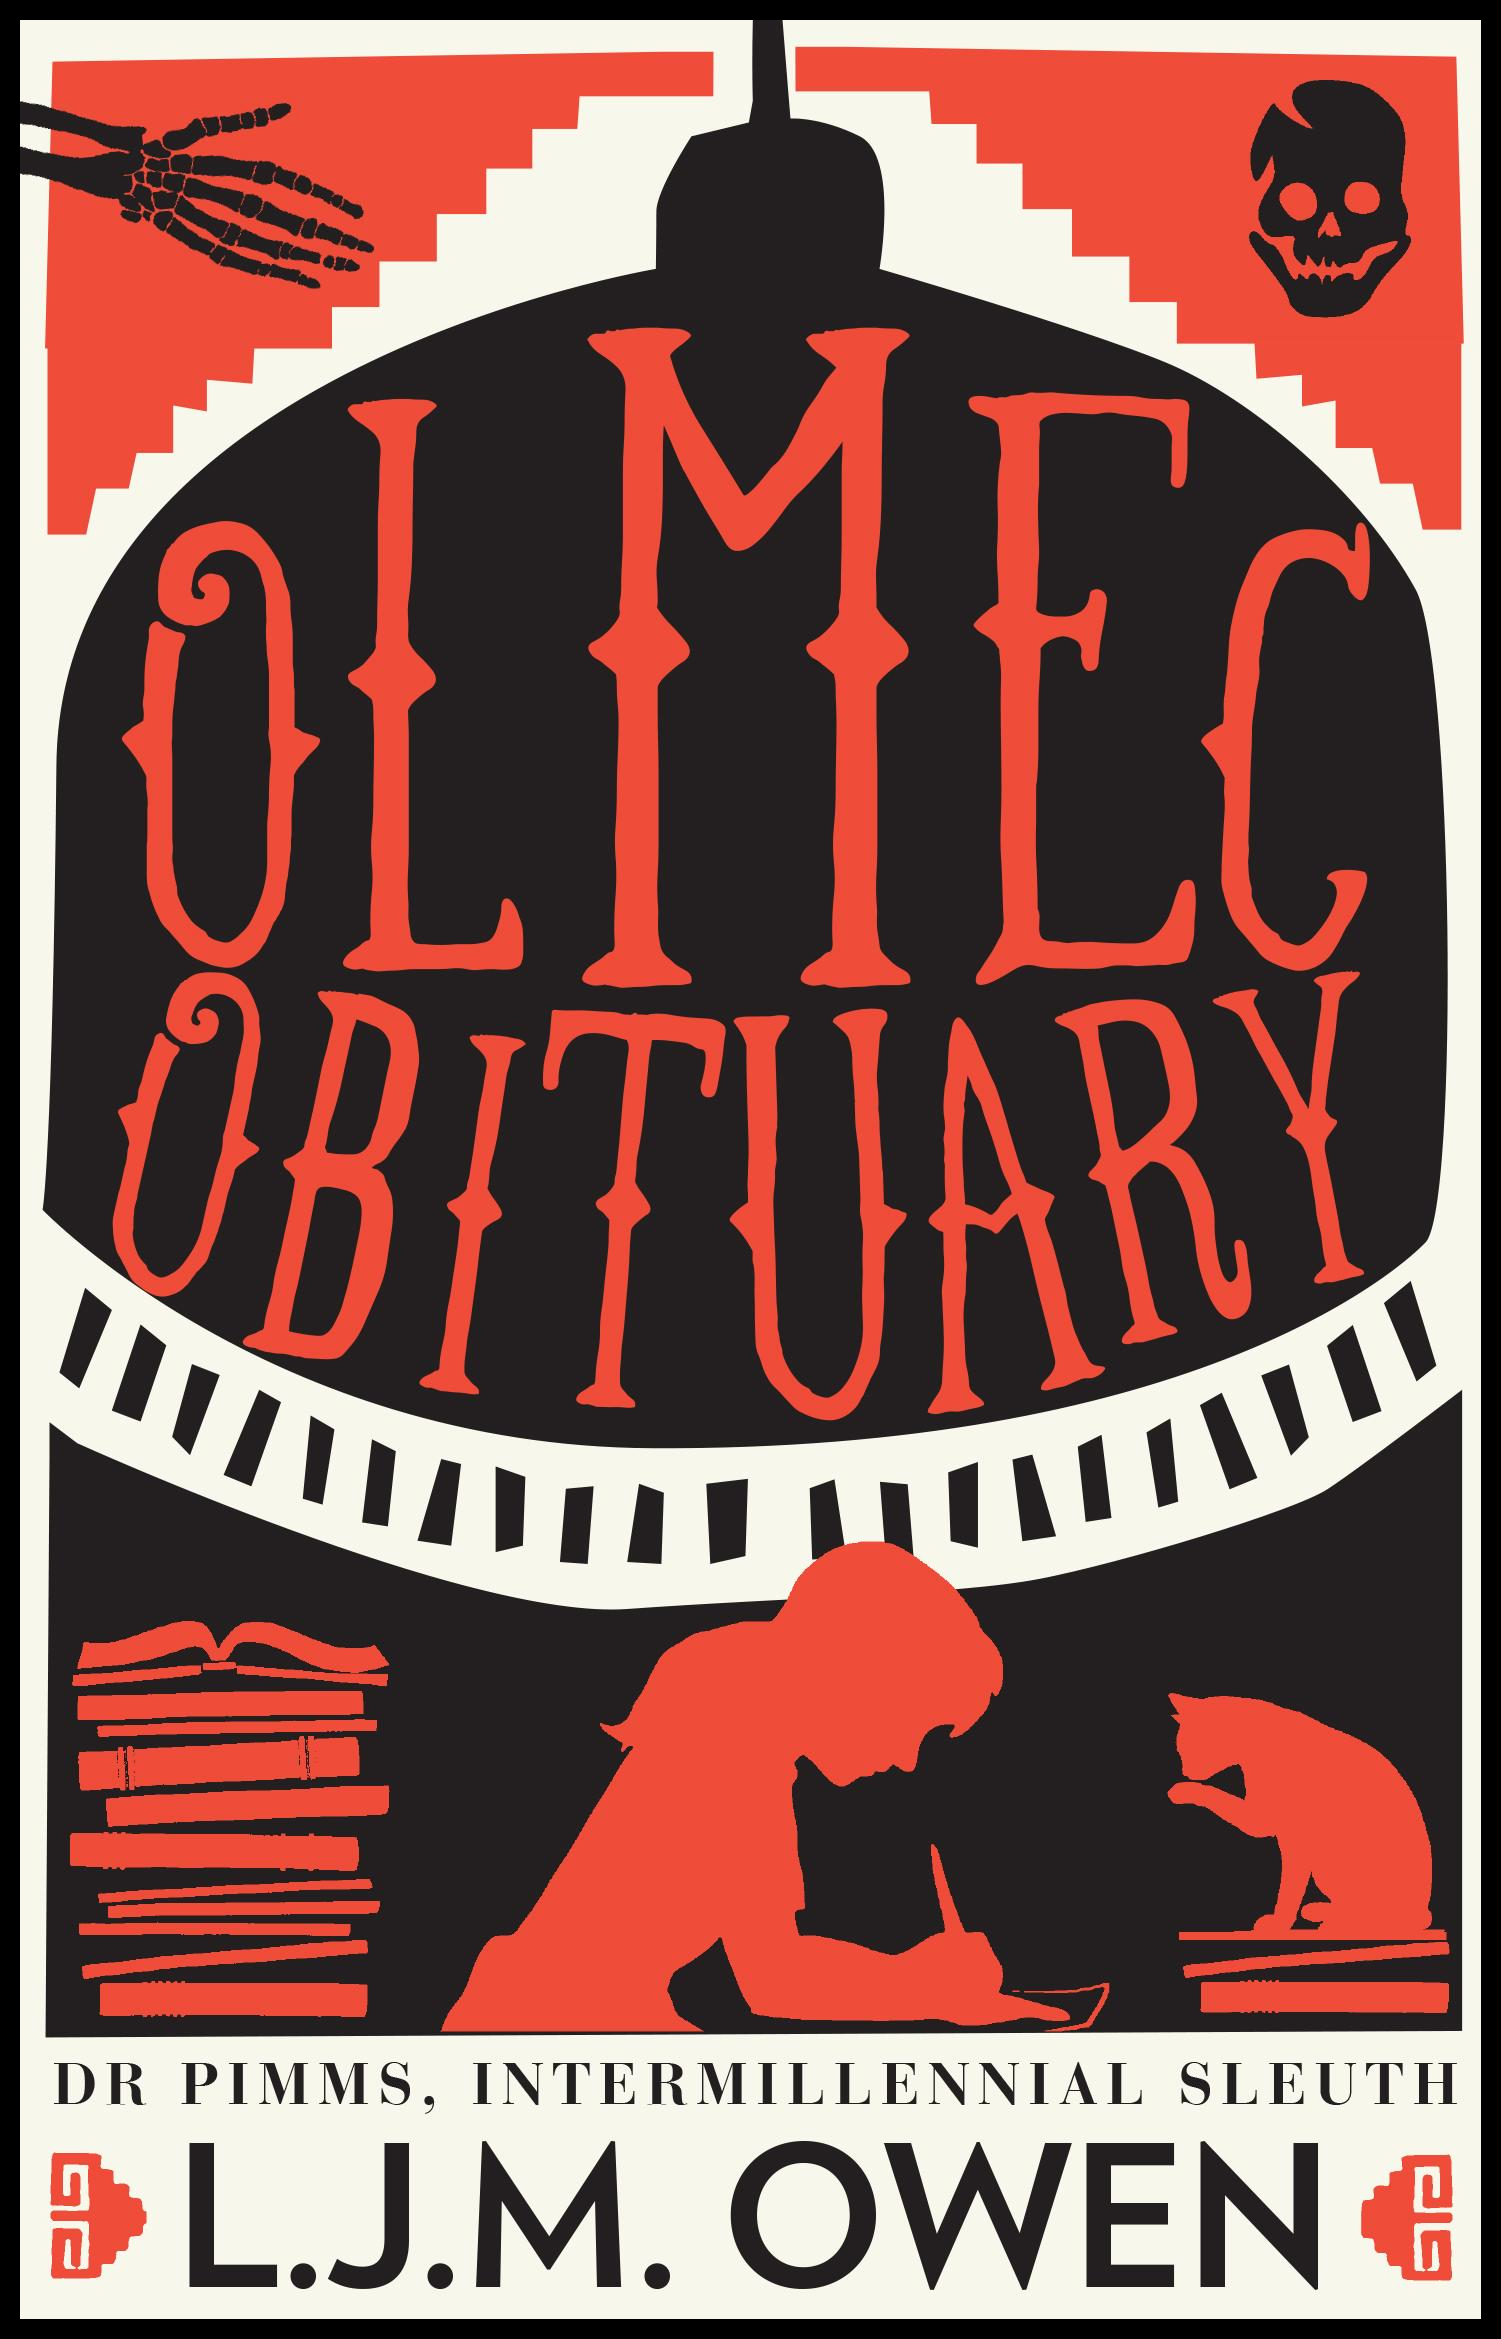 Olmec black border.png